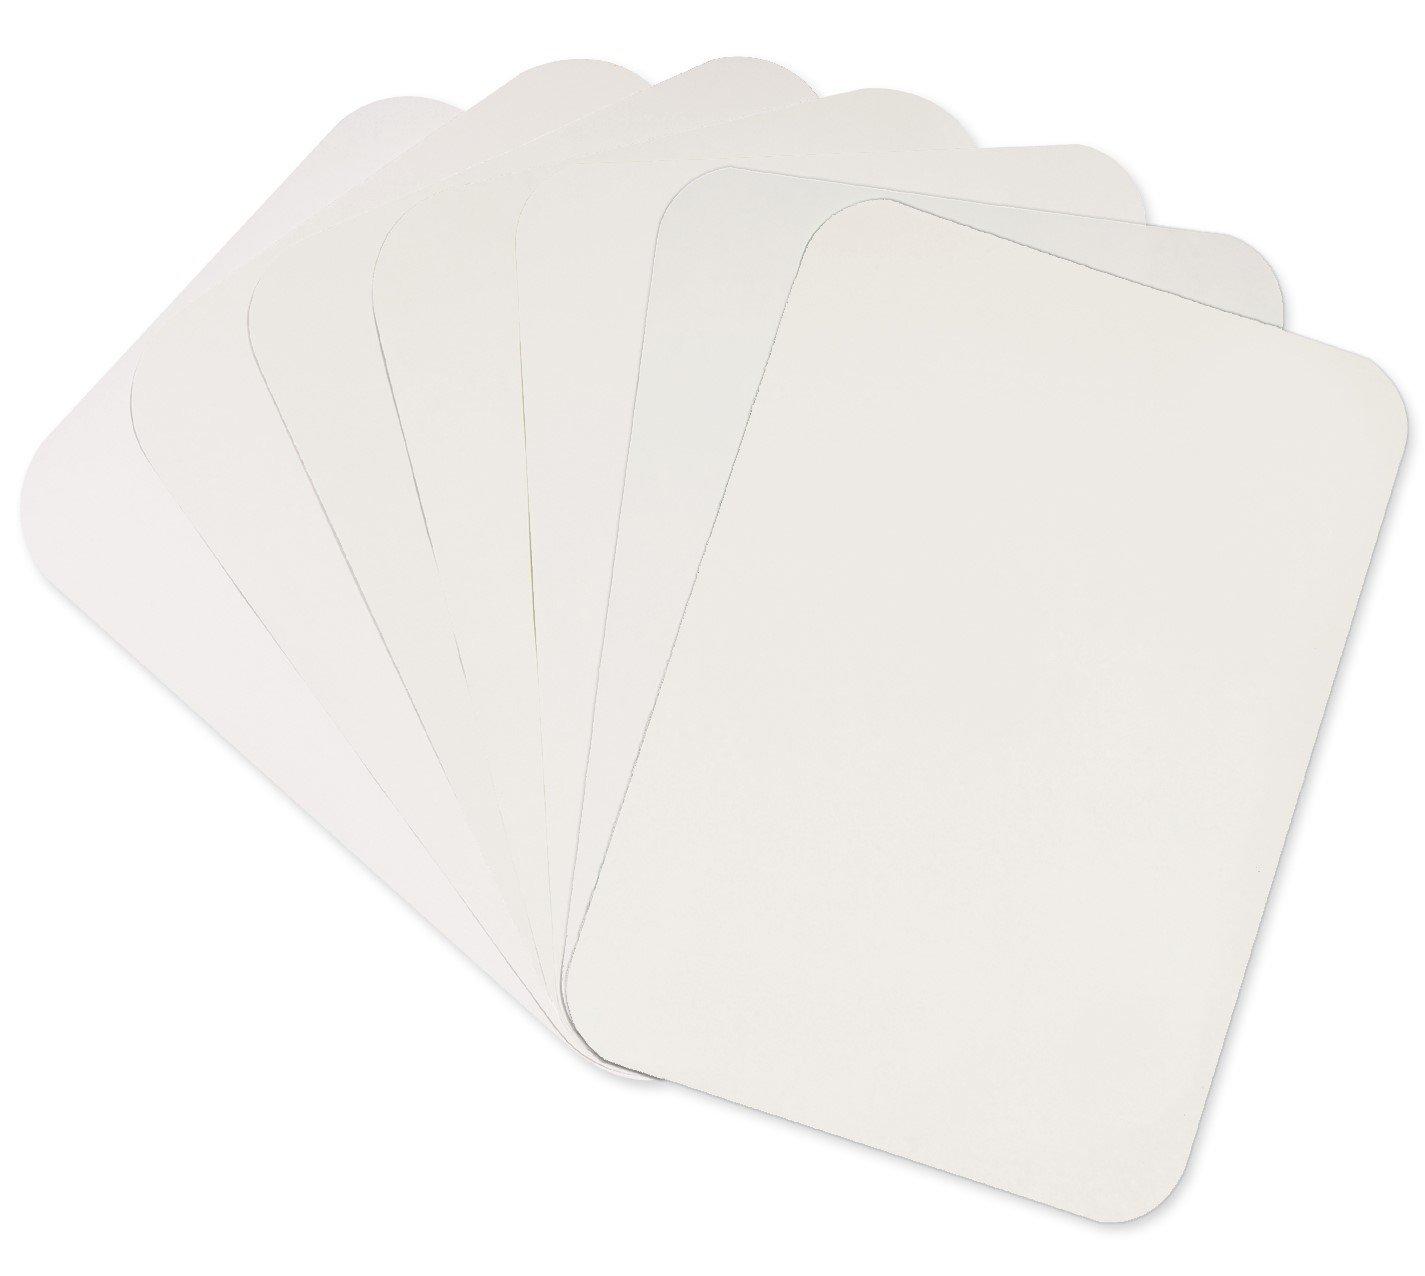 TIDI Ritter (B) Tray Covers, White